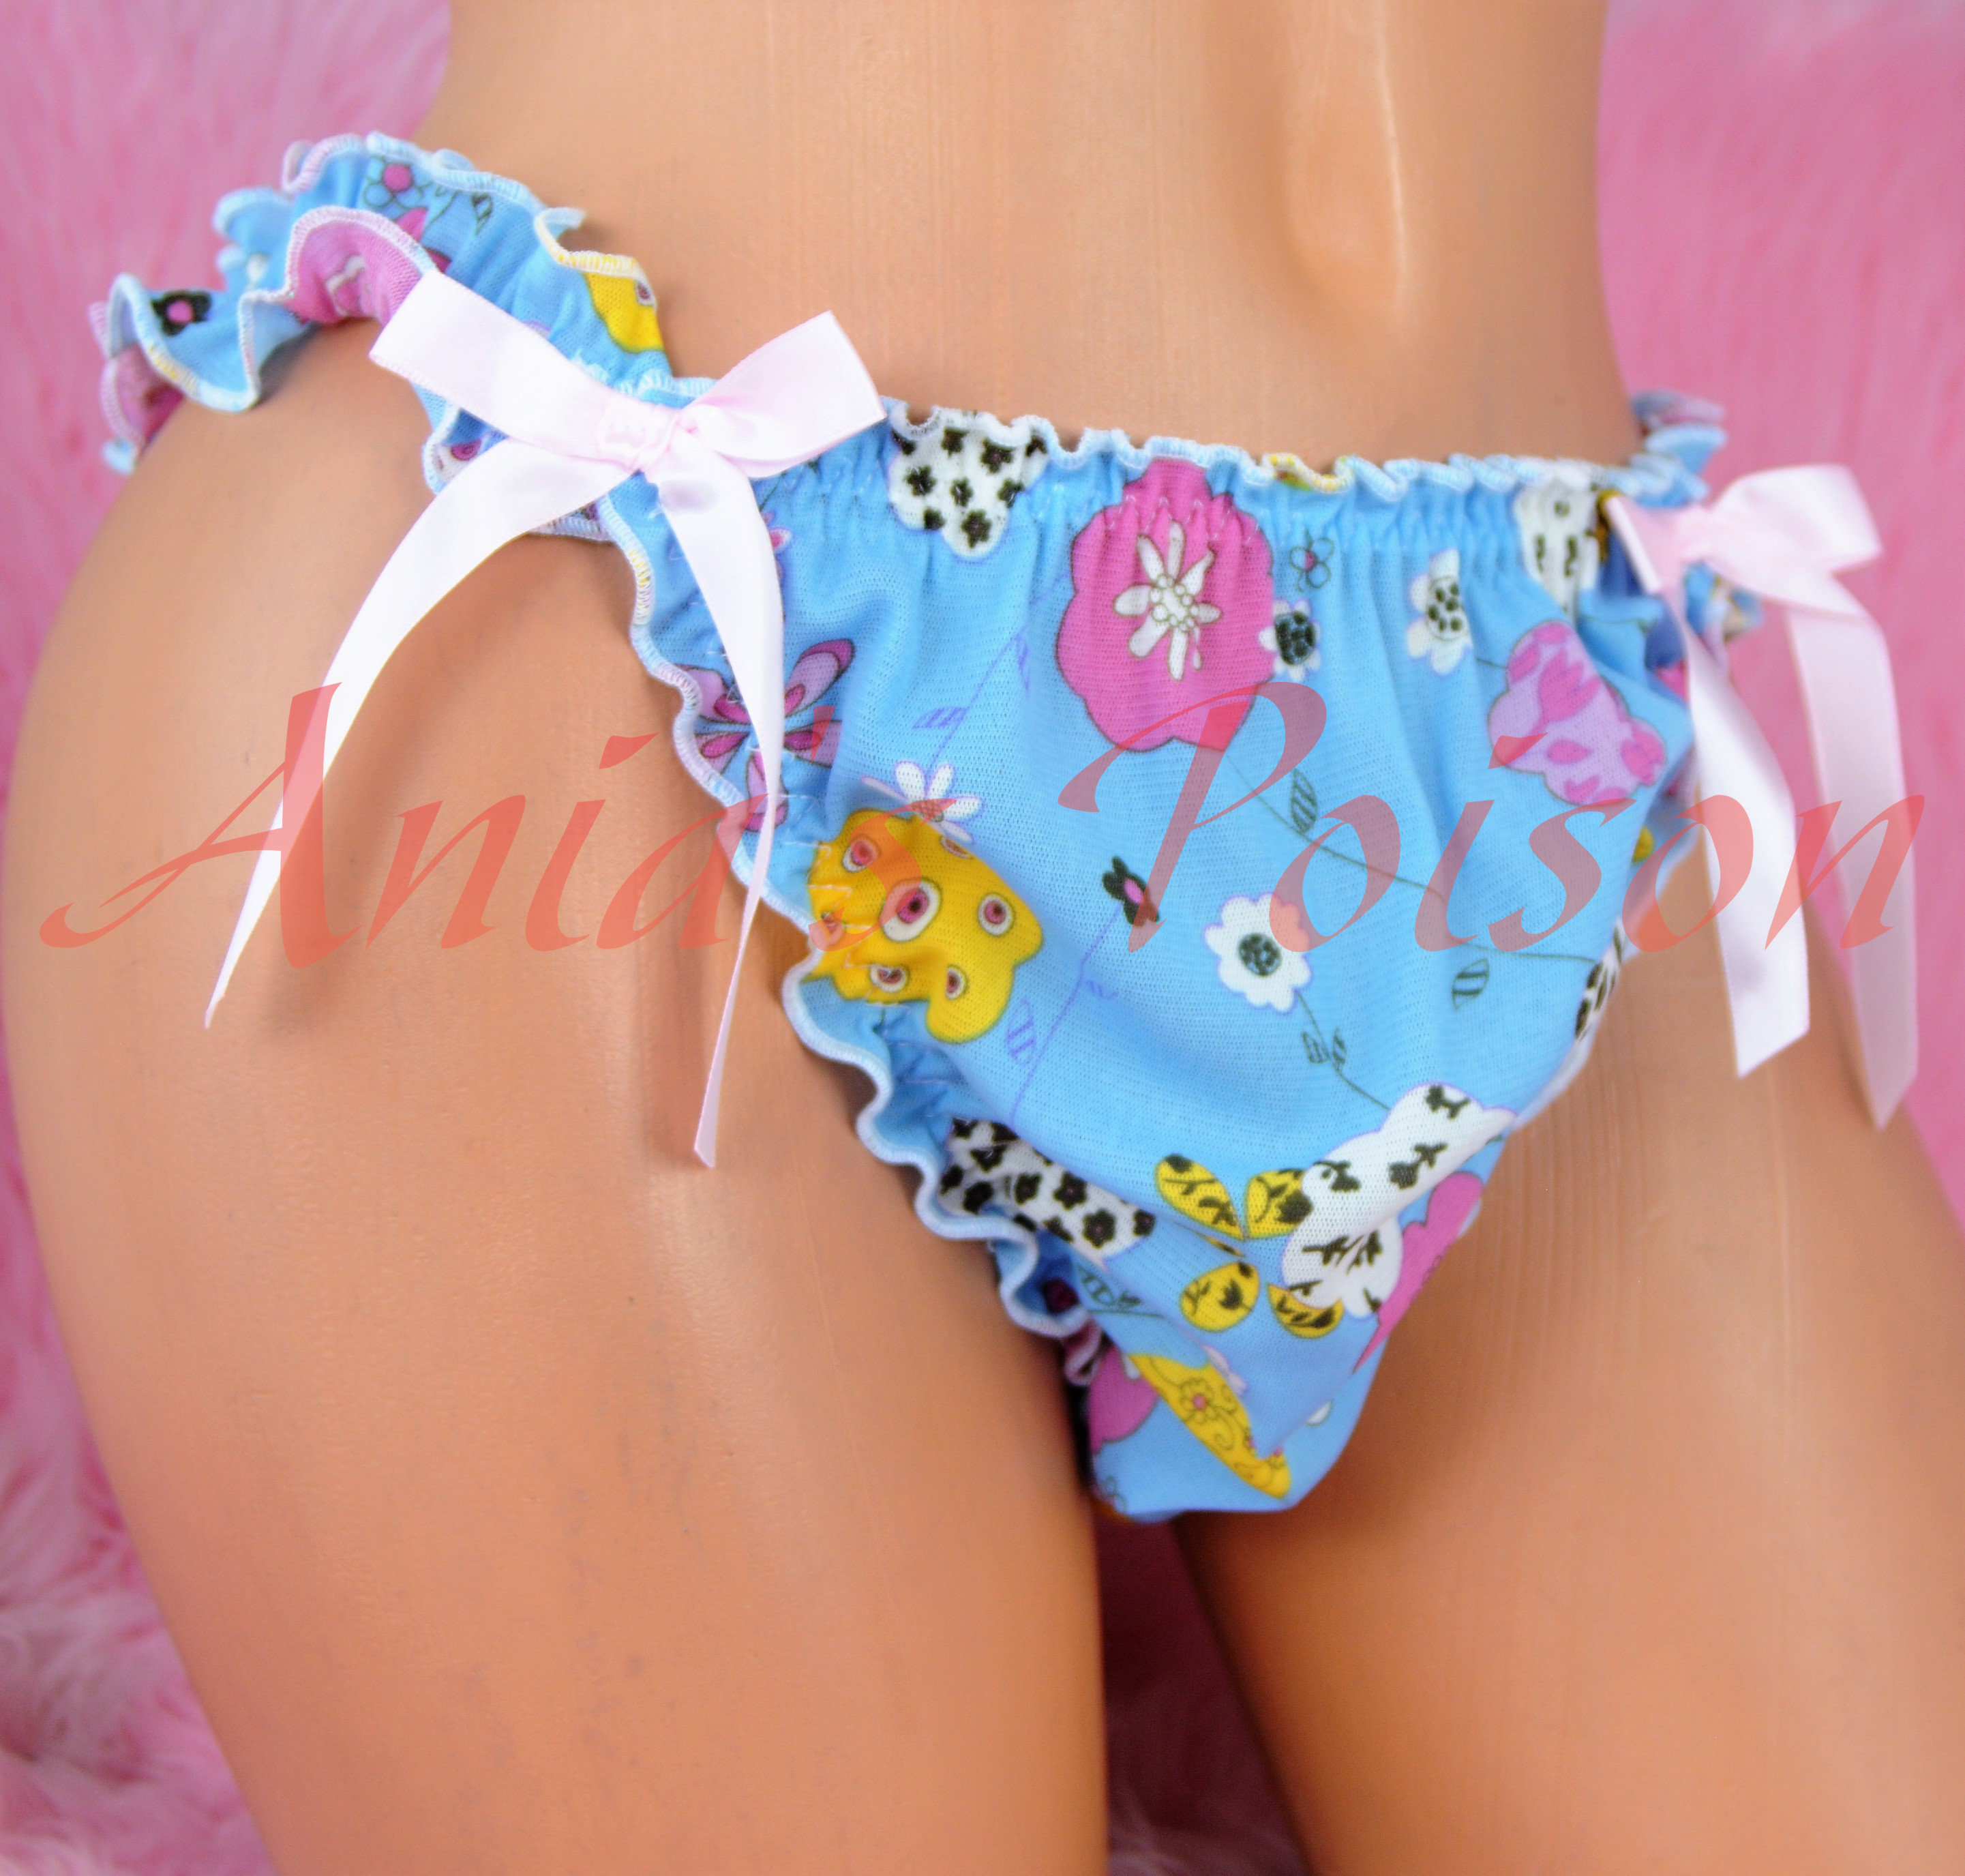 MANties  S M L XL XXL Girly floral Mesh stretch Ruffled string bikini sissy mens panties 00172